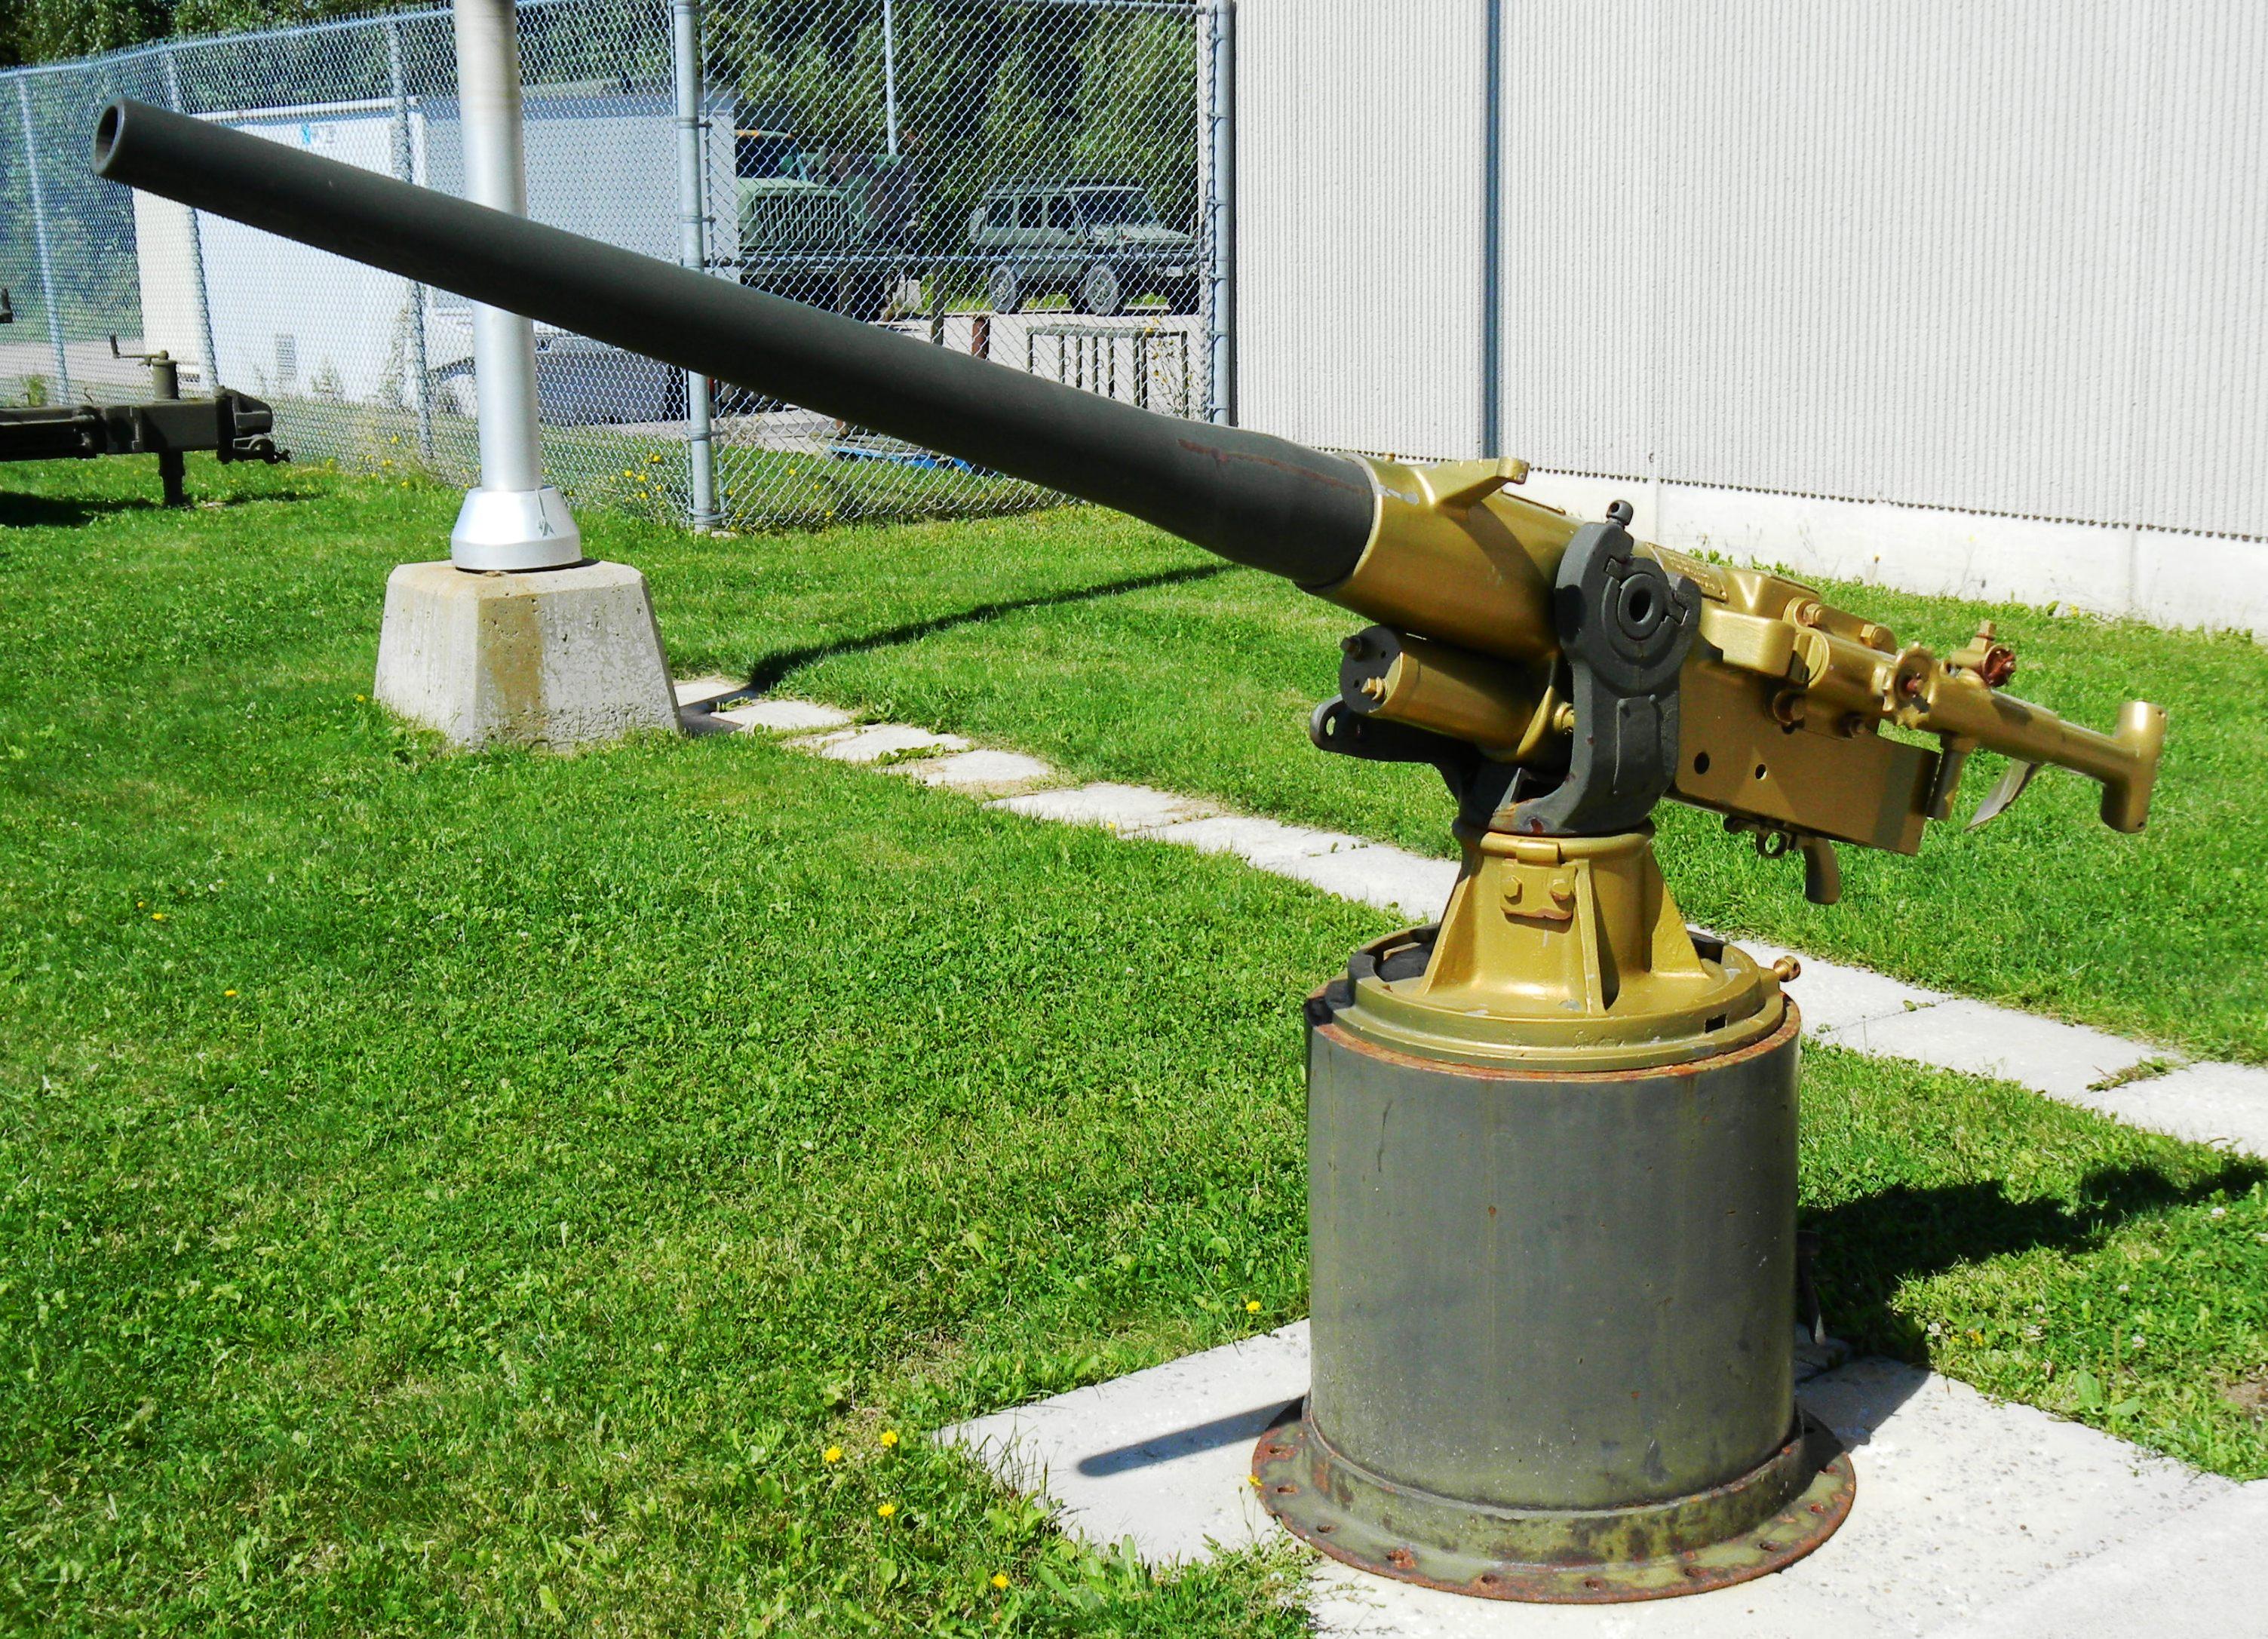 Vickers_Maxim_3_pounder_Semi-Automatic_Q